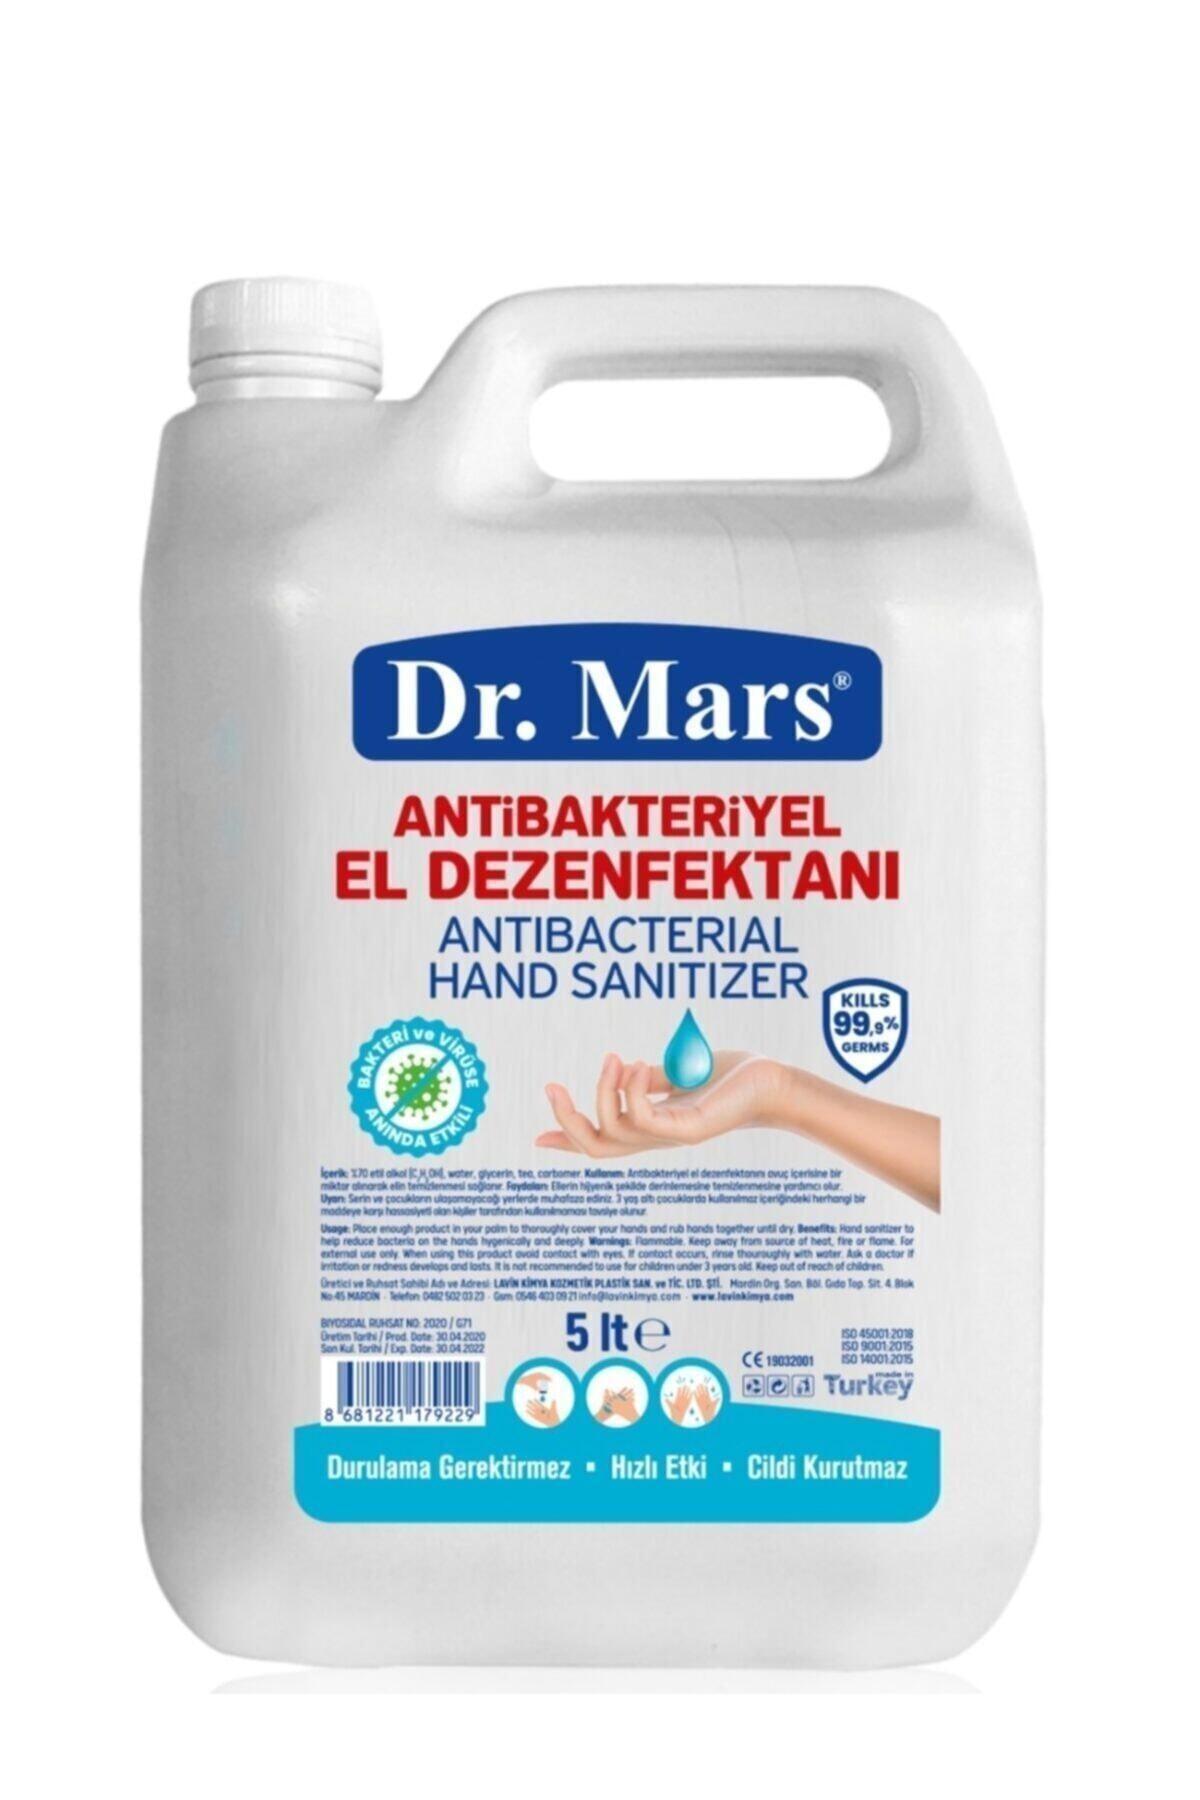 DR.MARS Antibakteriyel El Dezenfektanı - 5 Lt 1